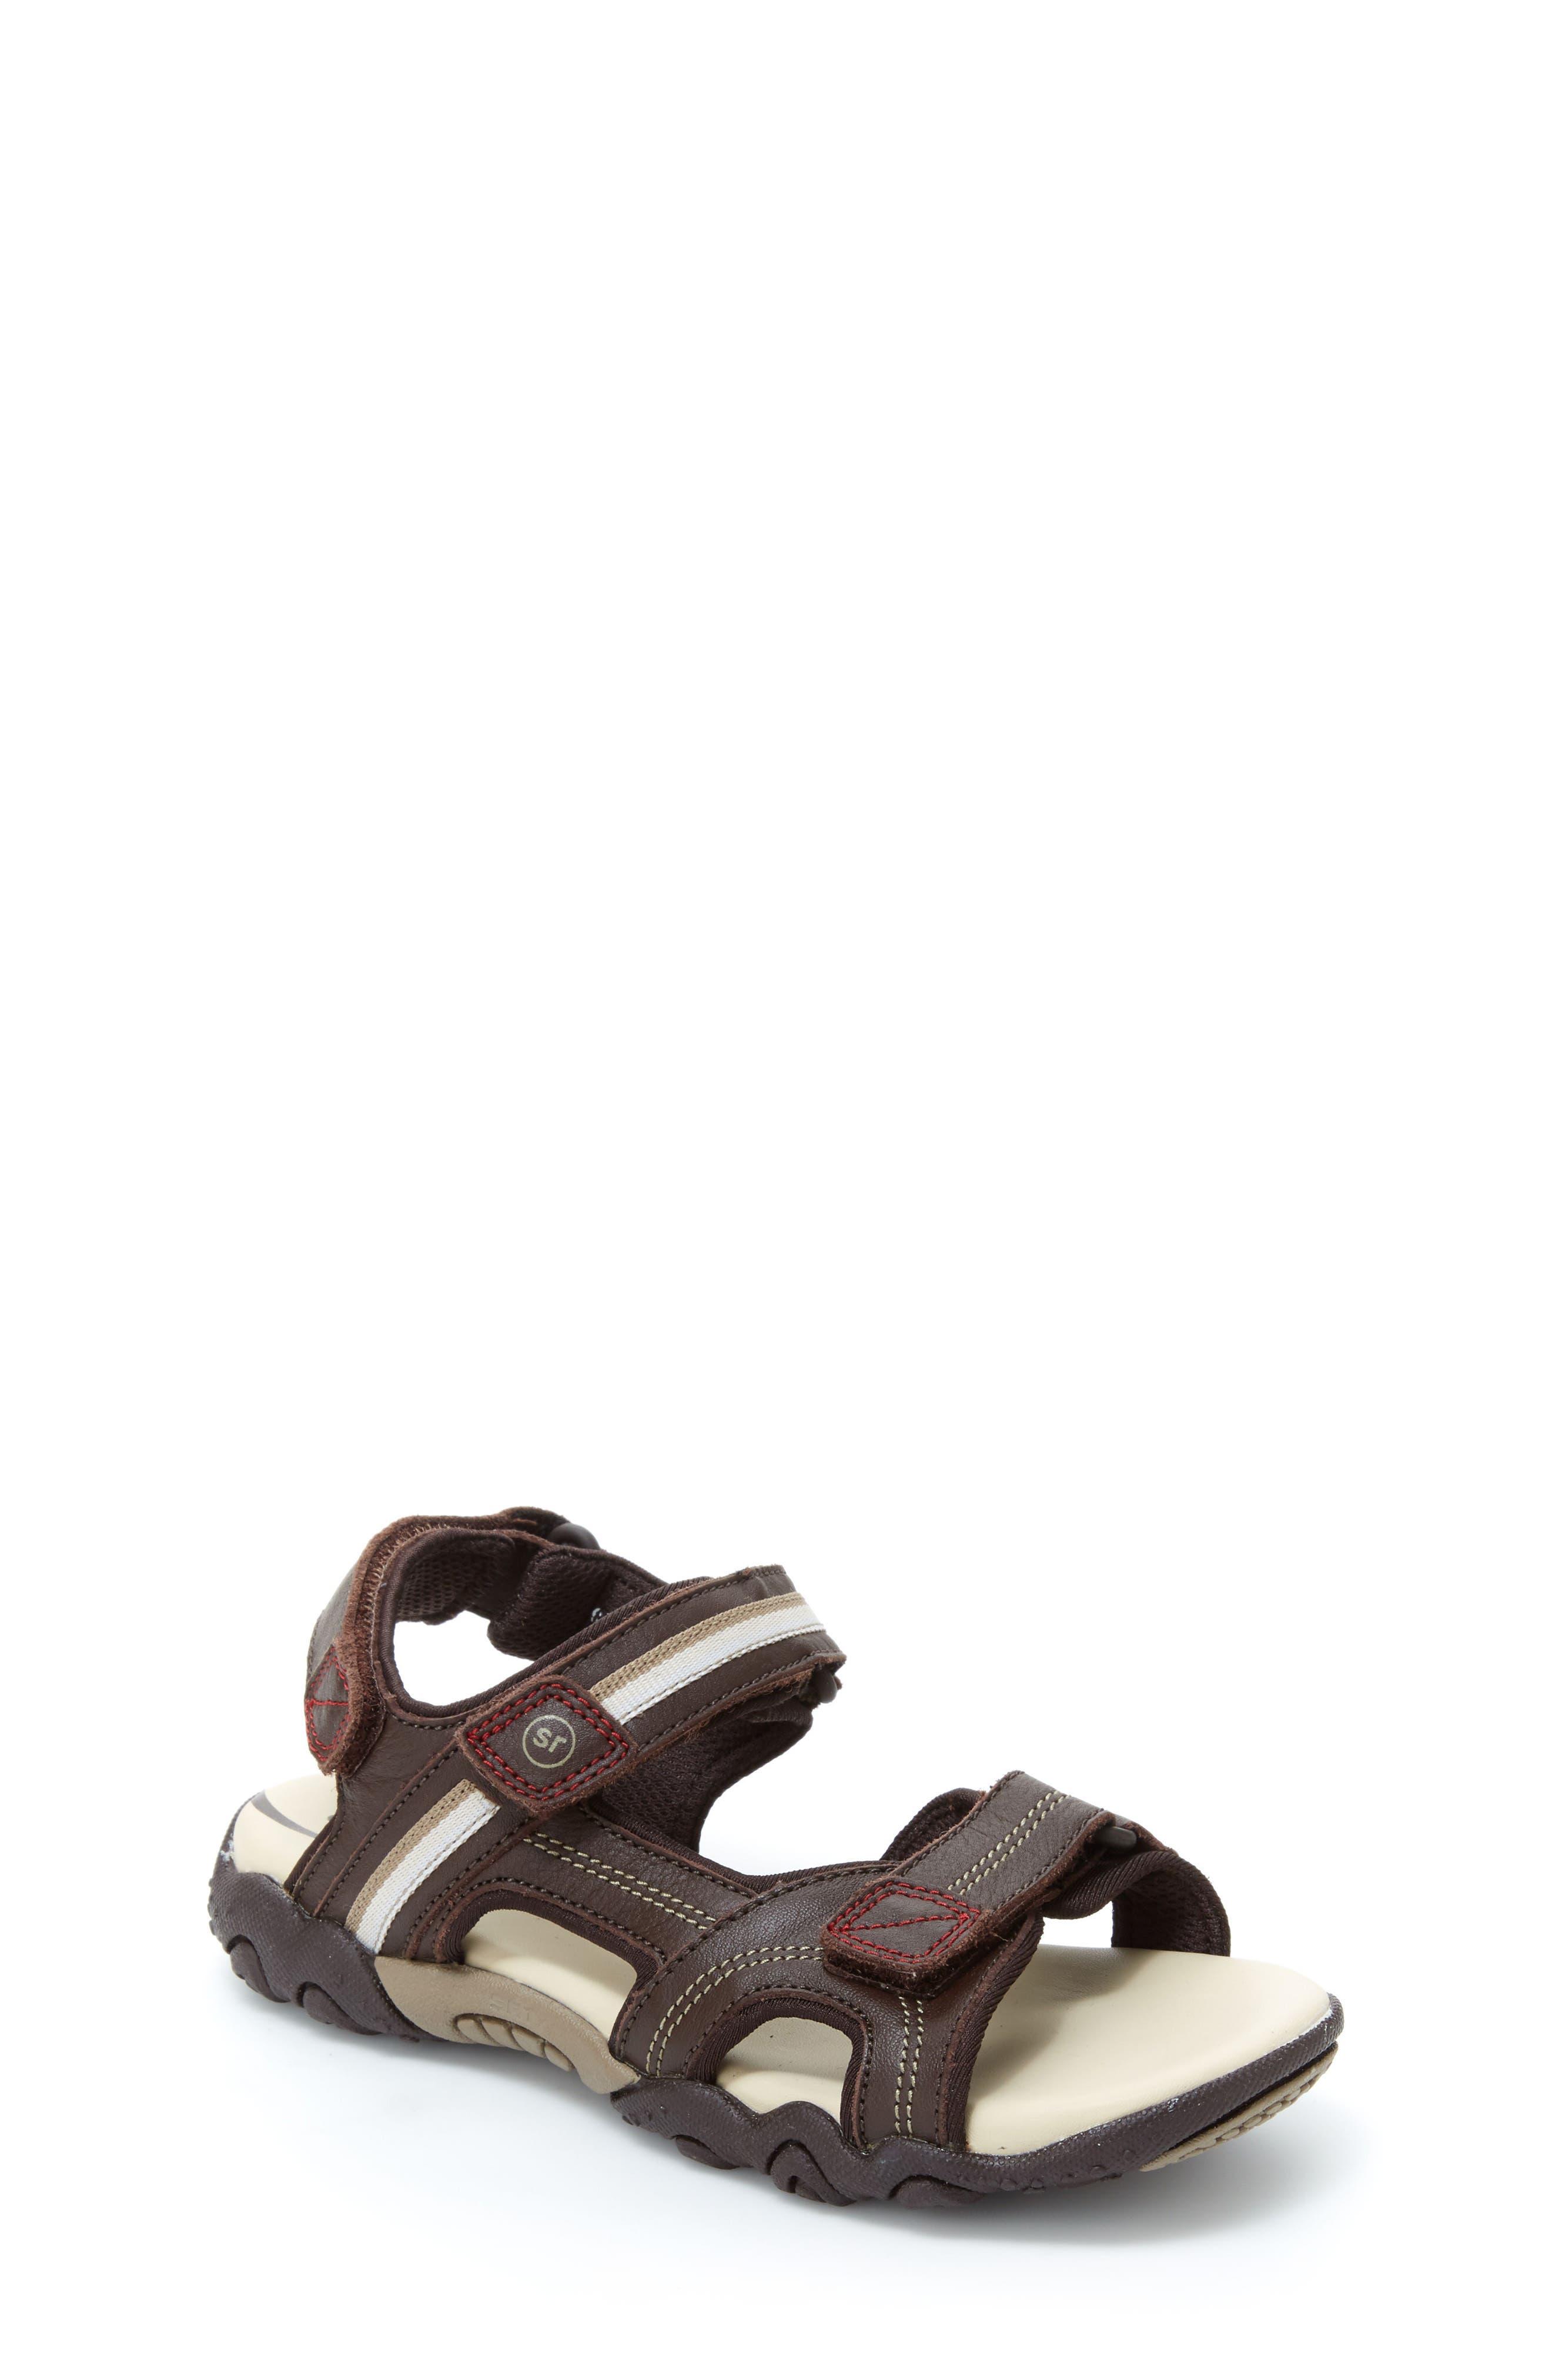 Garth Active Sandal,                         Main,                         color, 200